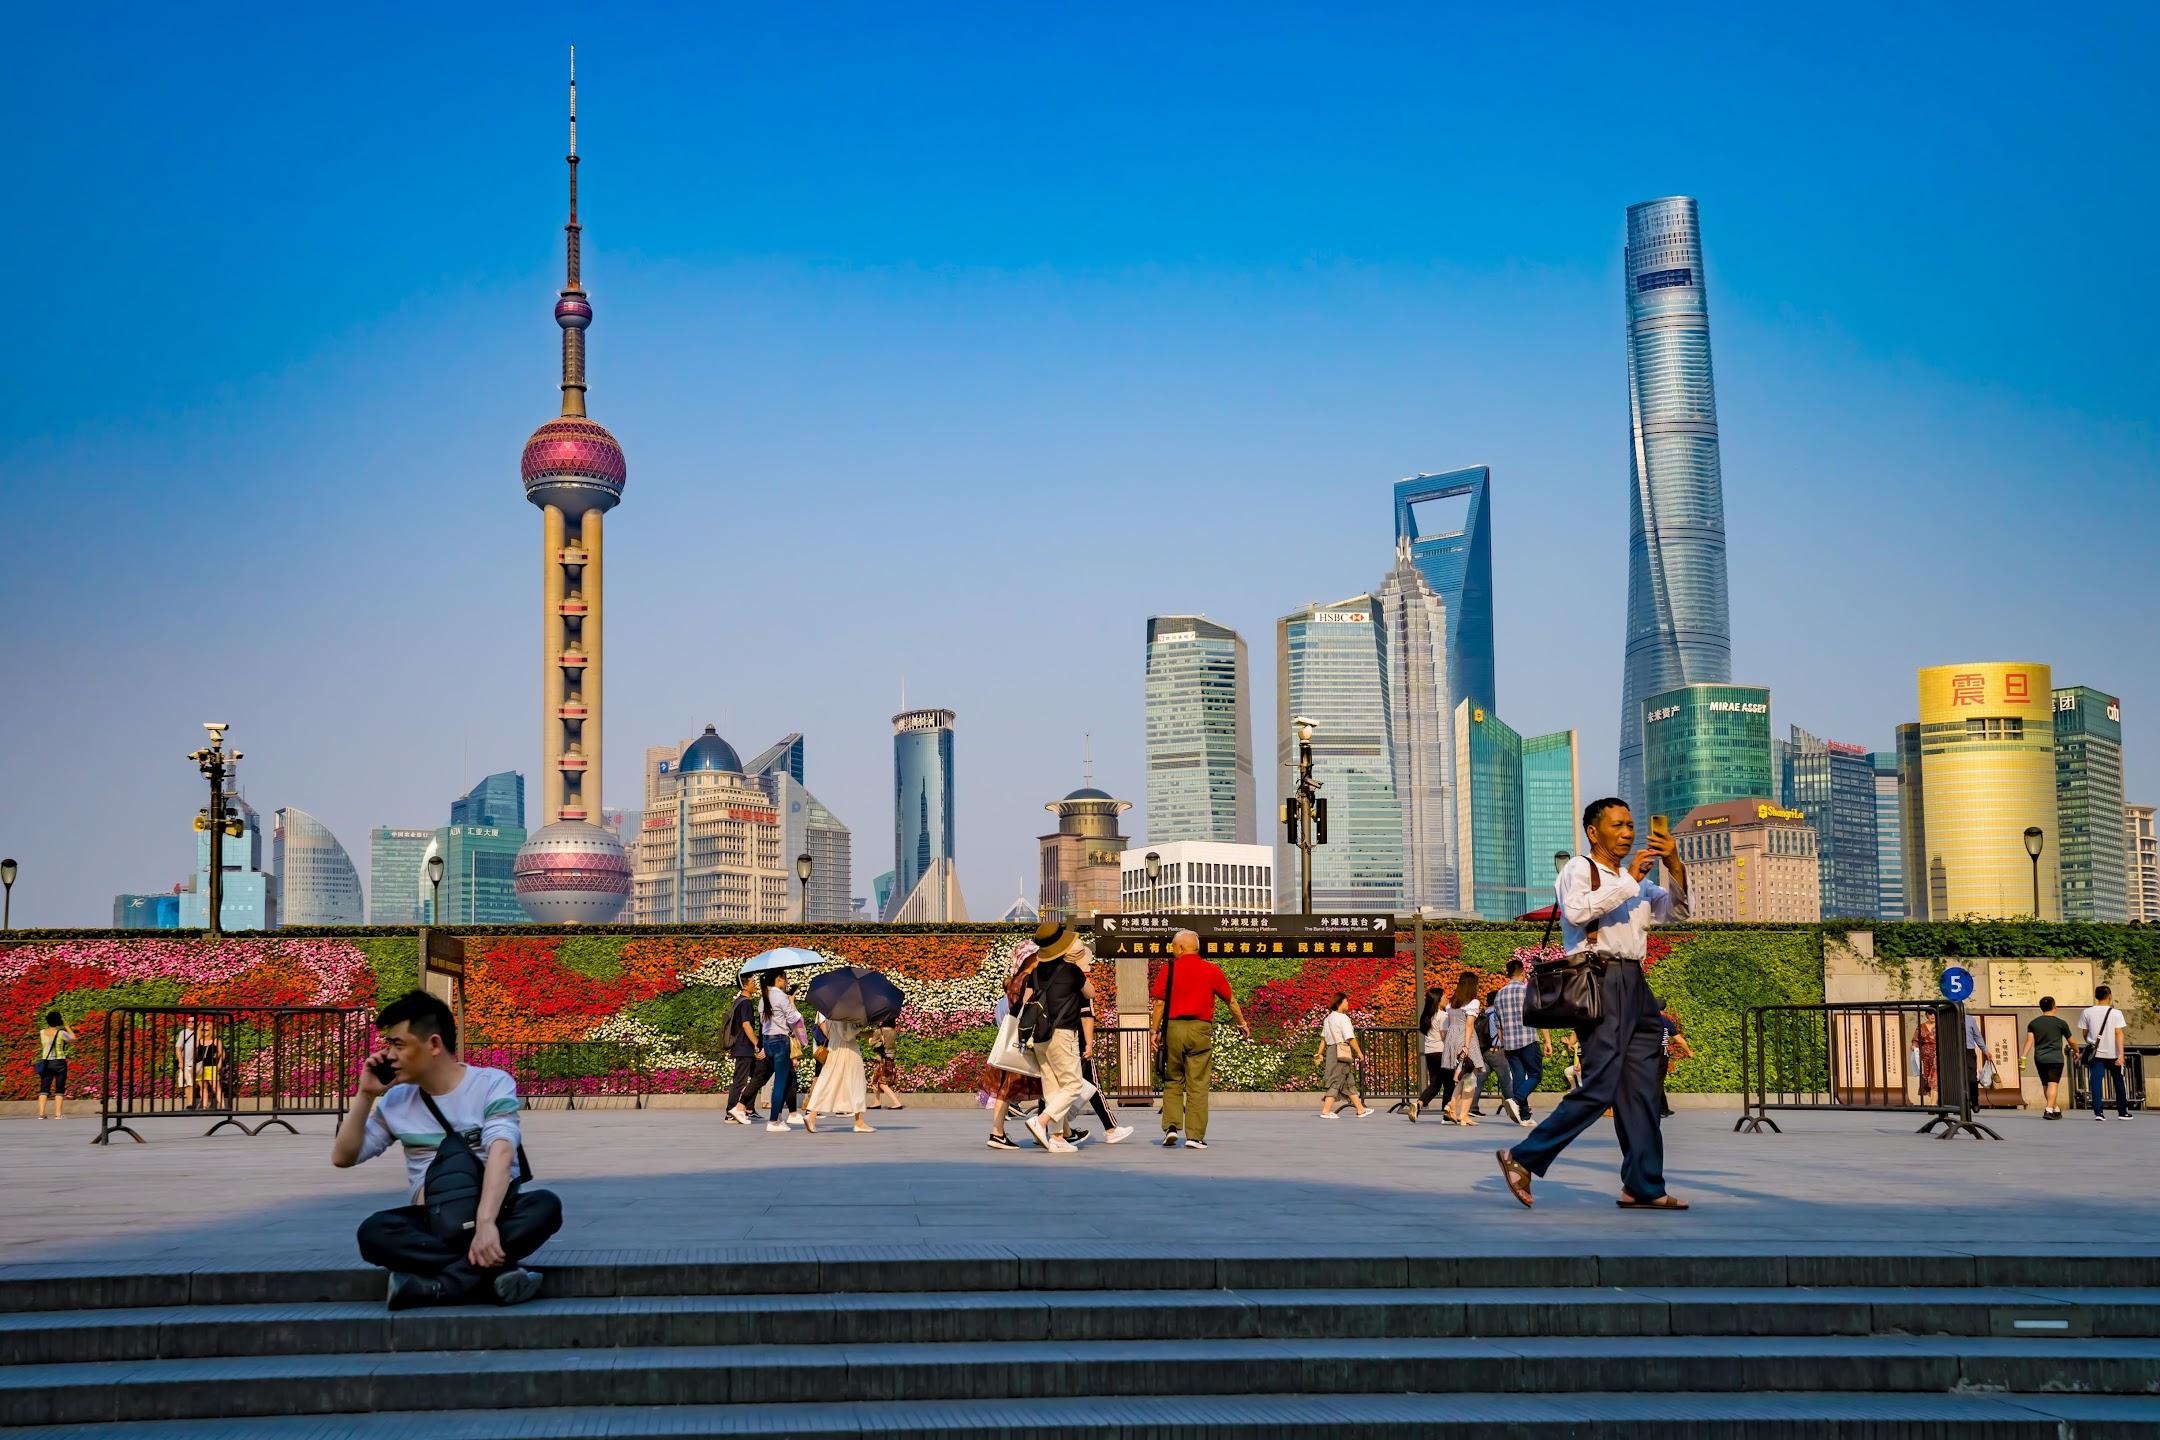 Shanghai Waitan (The Bund) Pudong2